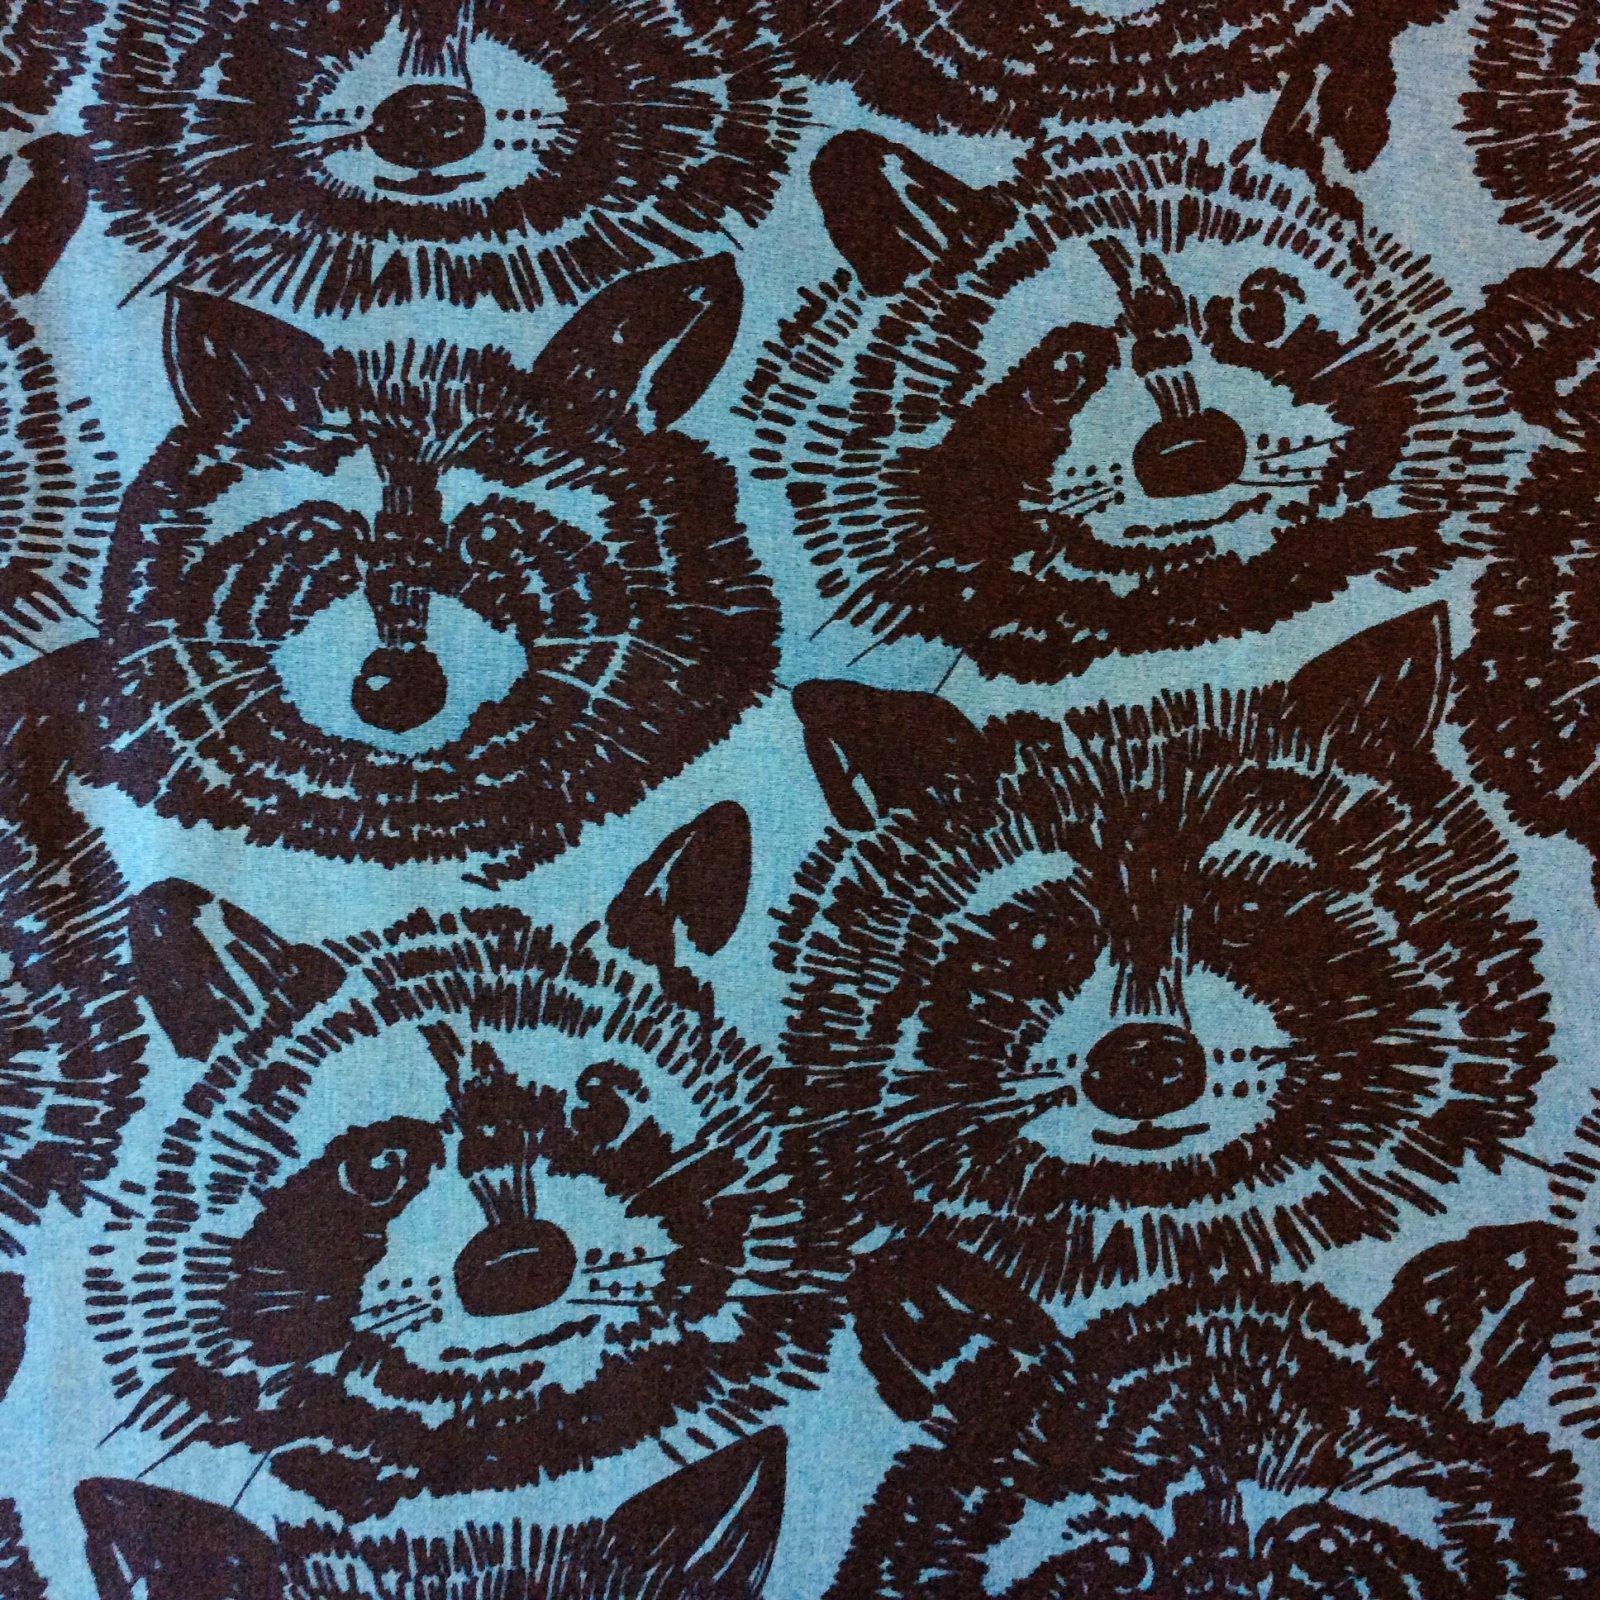 Raccoon Varmit AH208 Alexander Henry Raccoon Animal Forest Woods Nature Cotton Quilt Fabric